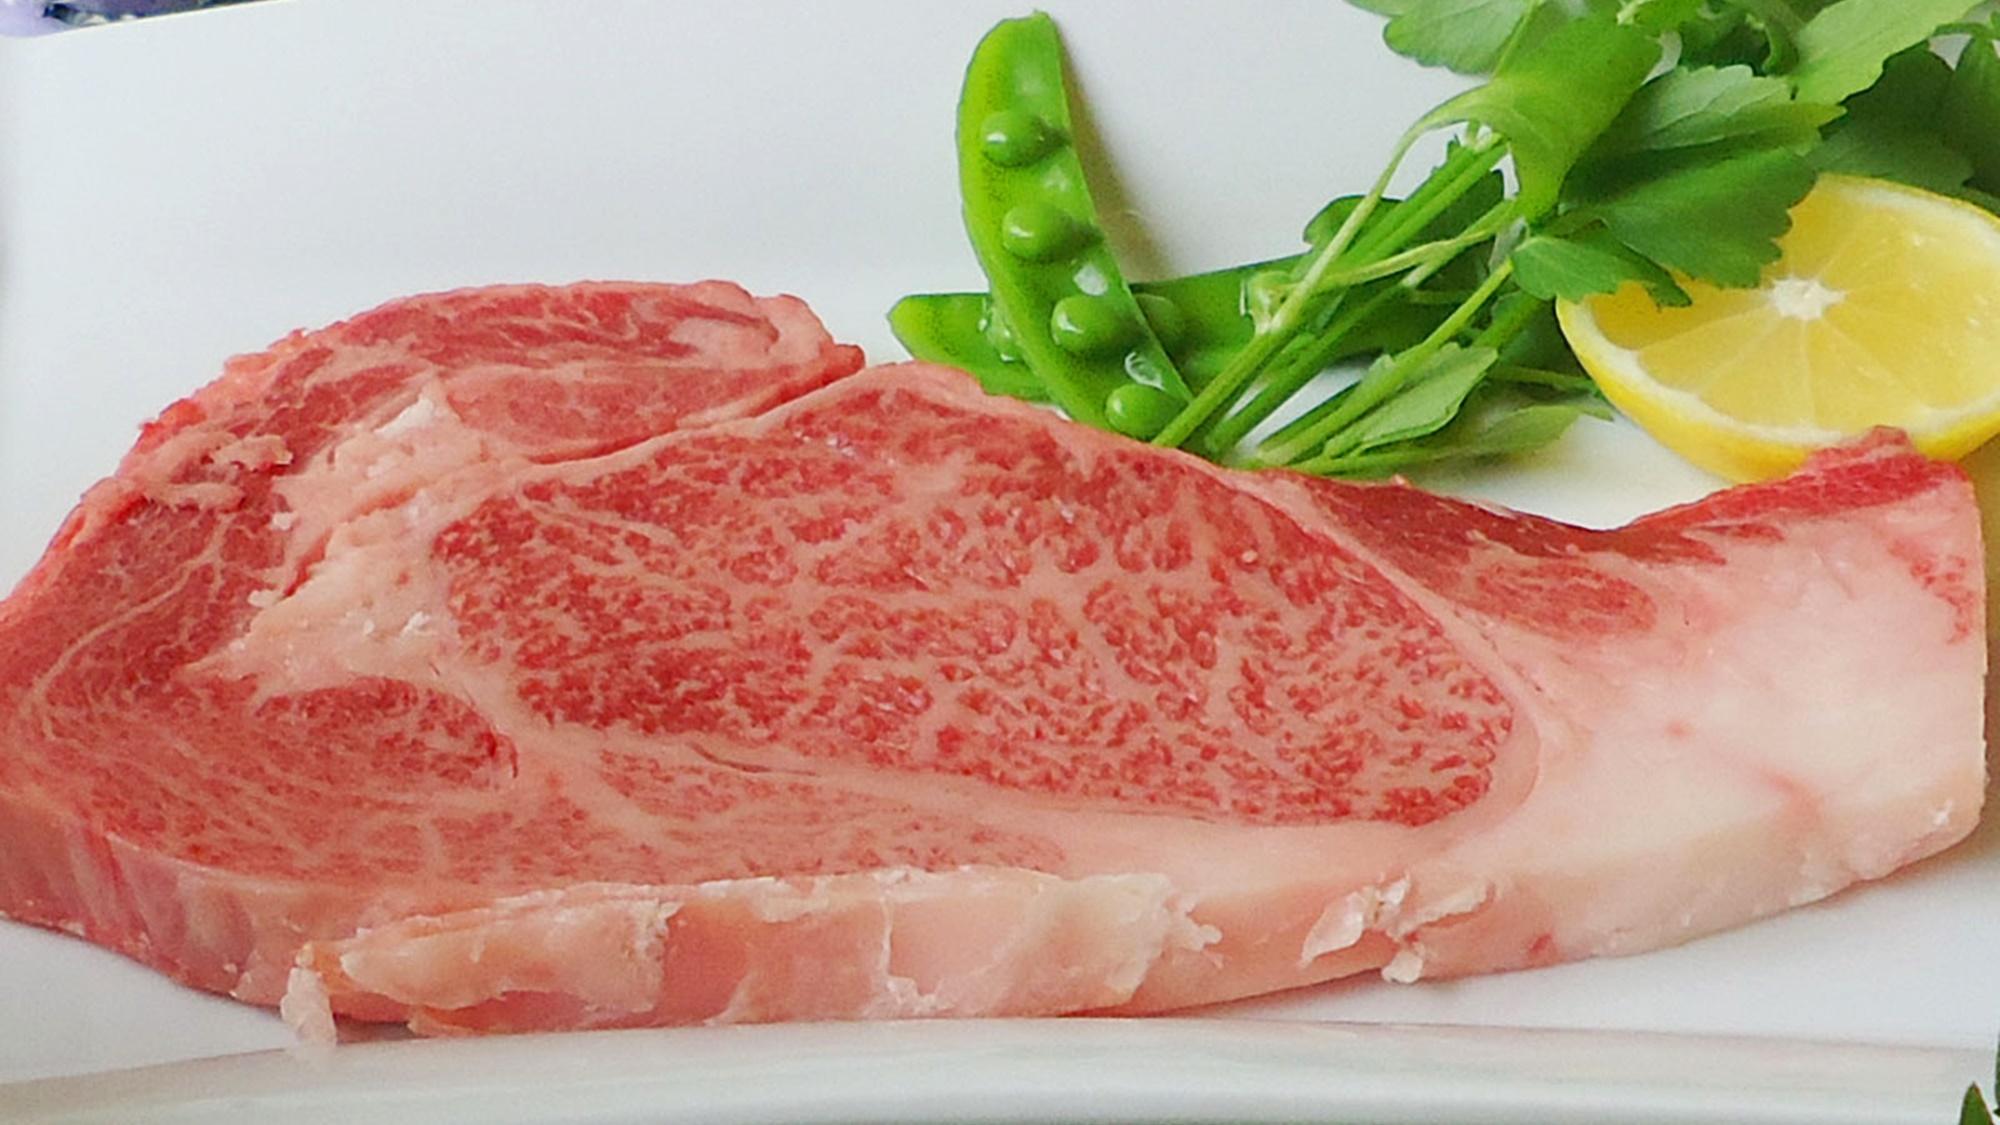 *◆A4〜A5ランク◆国産黒毛和牛を豪快にステーキで!